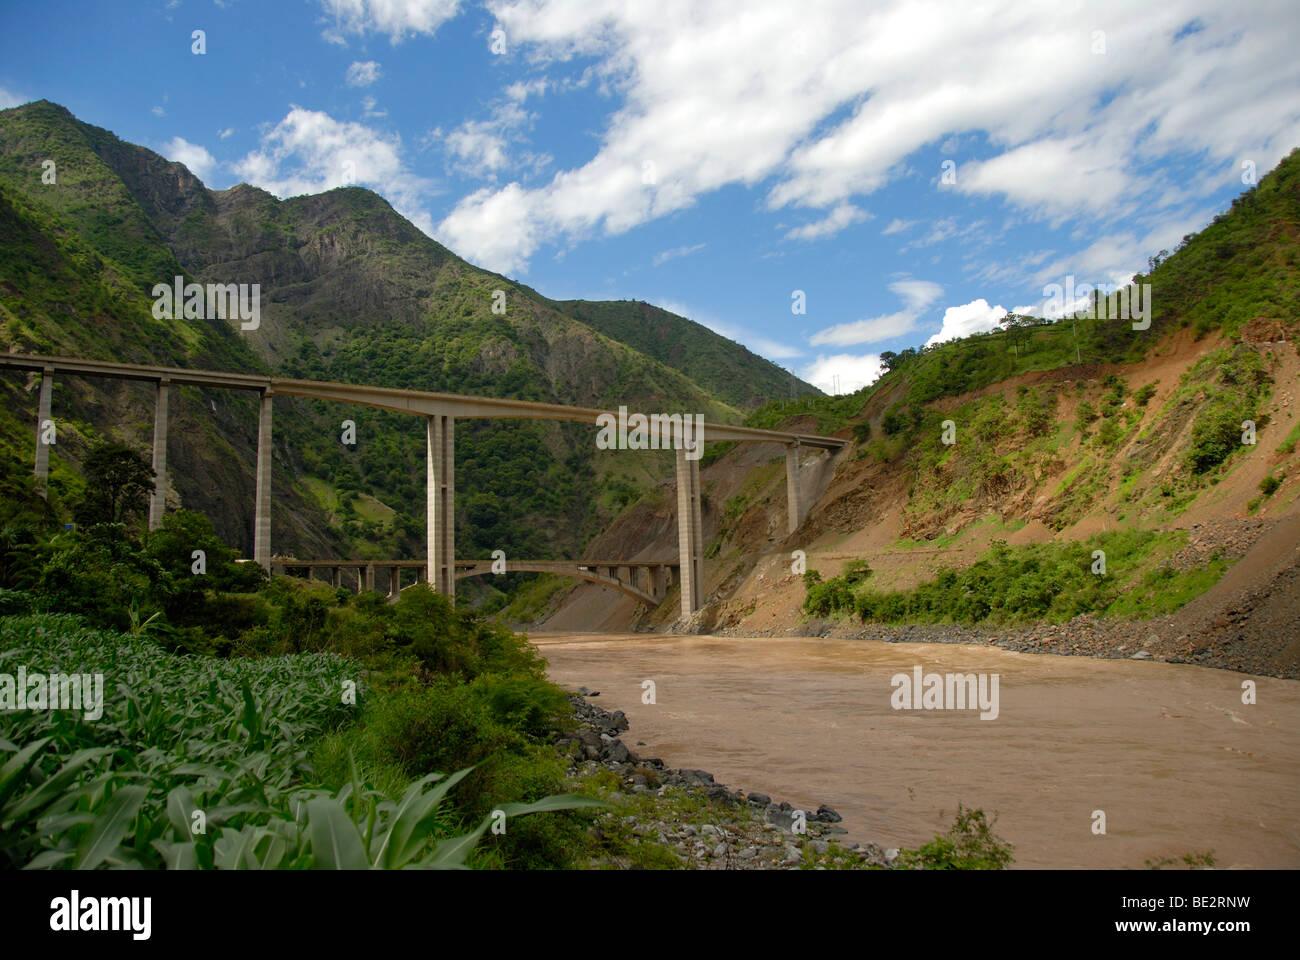 New and old bridge over the Yangtze River, Yangzi Jiang in Lijiang, Yunnan Province, People's Republic of China, Stock Photo